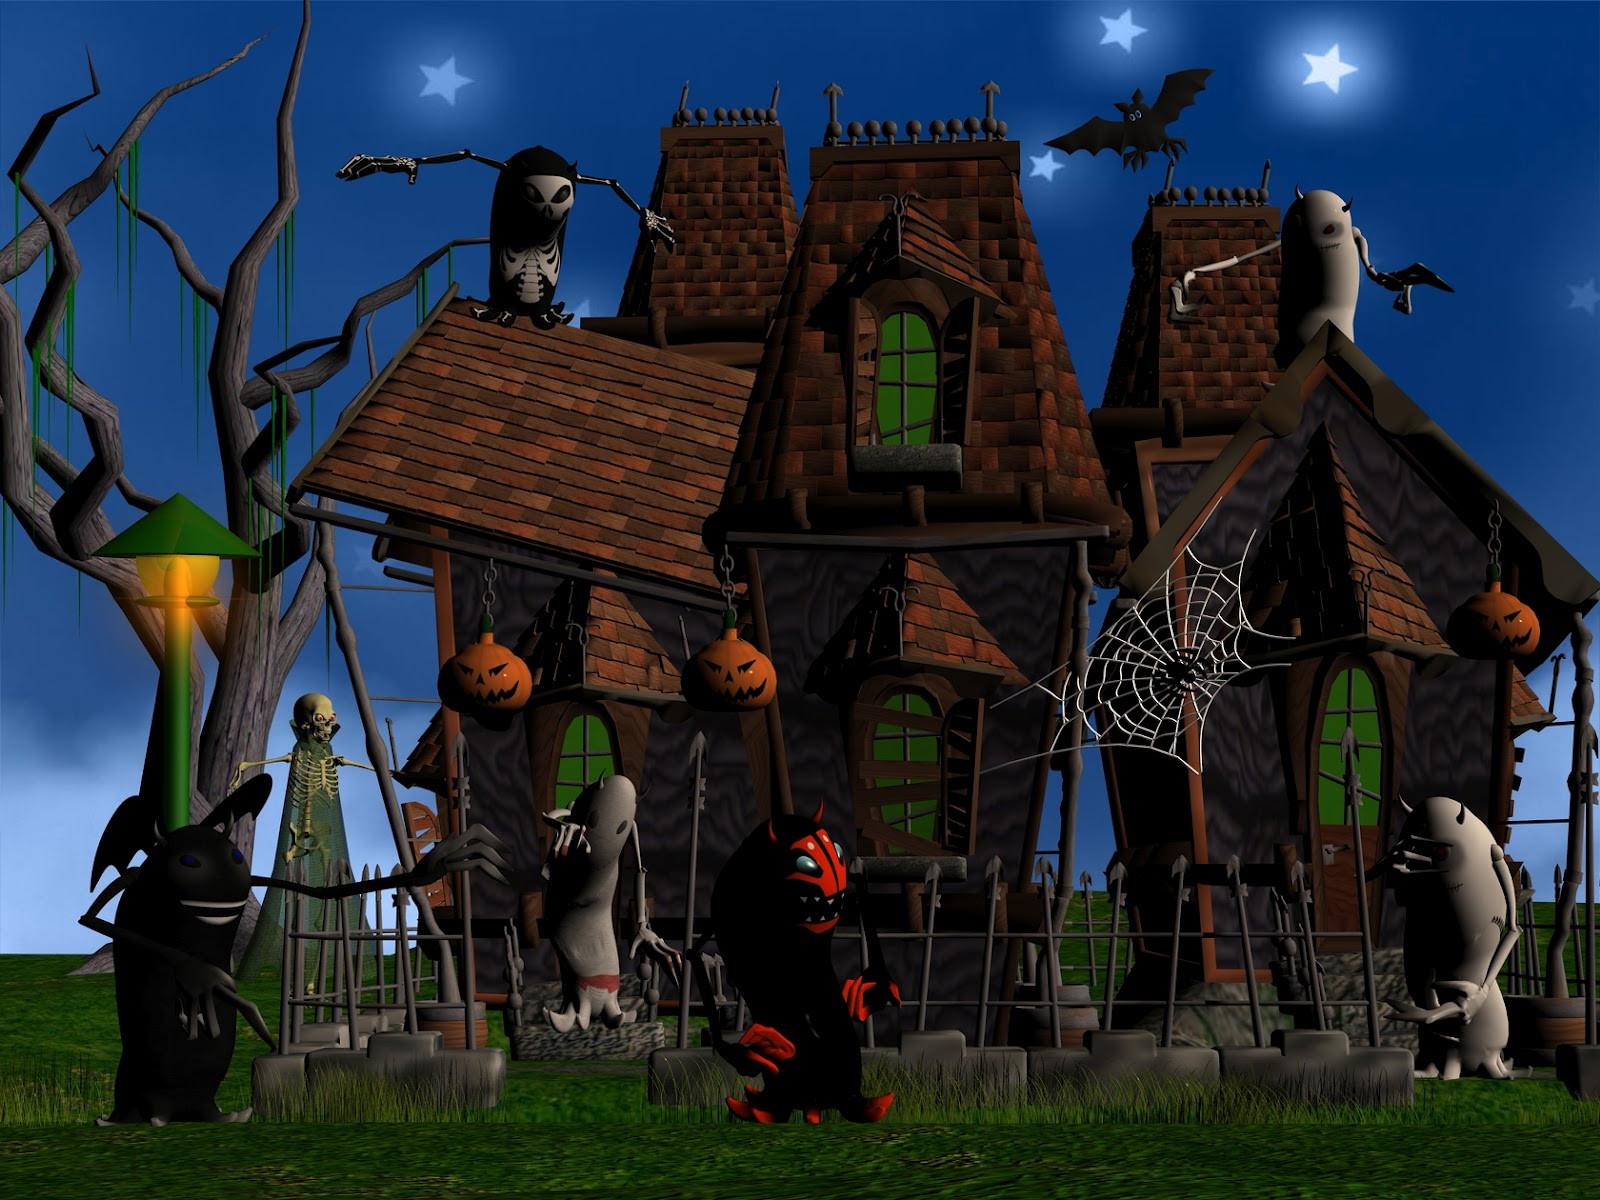 Halloween 3D Wallpaper  3D Halloween puter Wallpaper WallpaperSafari